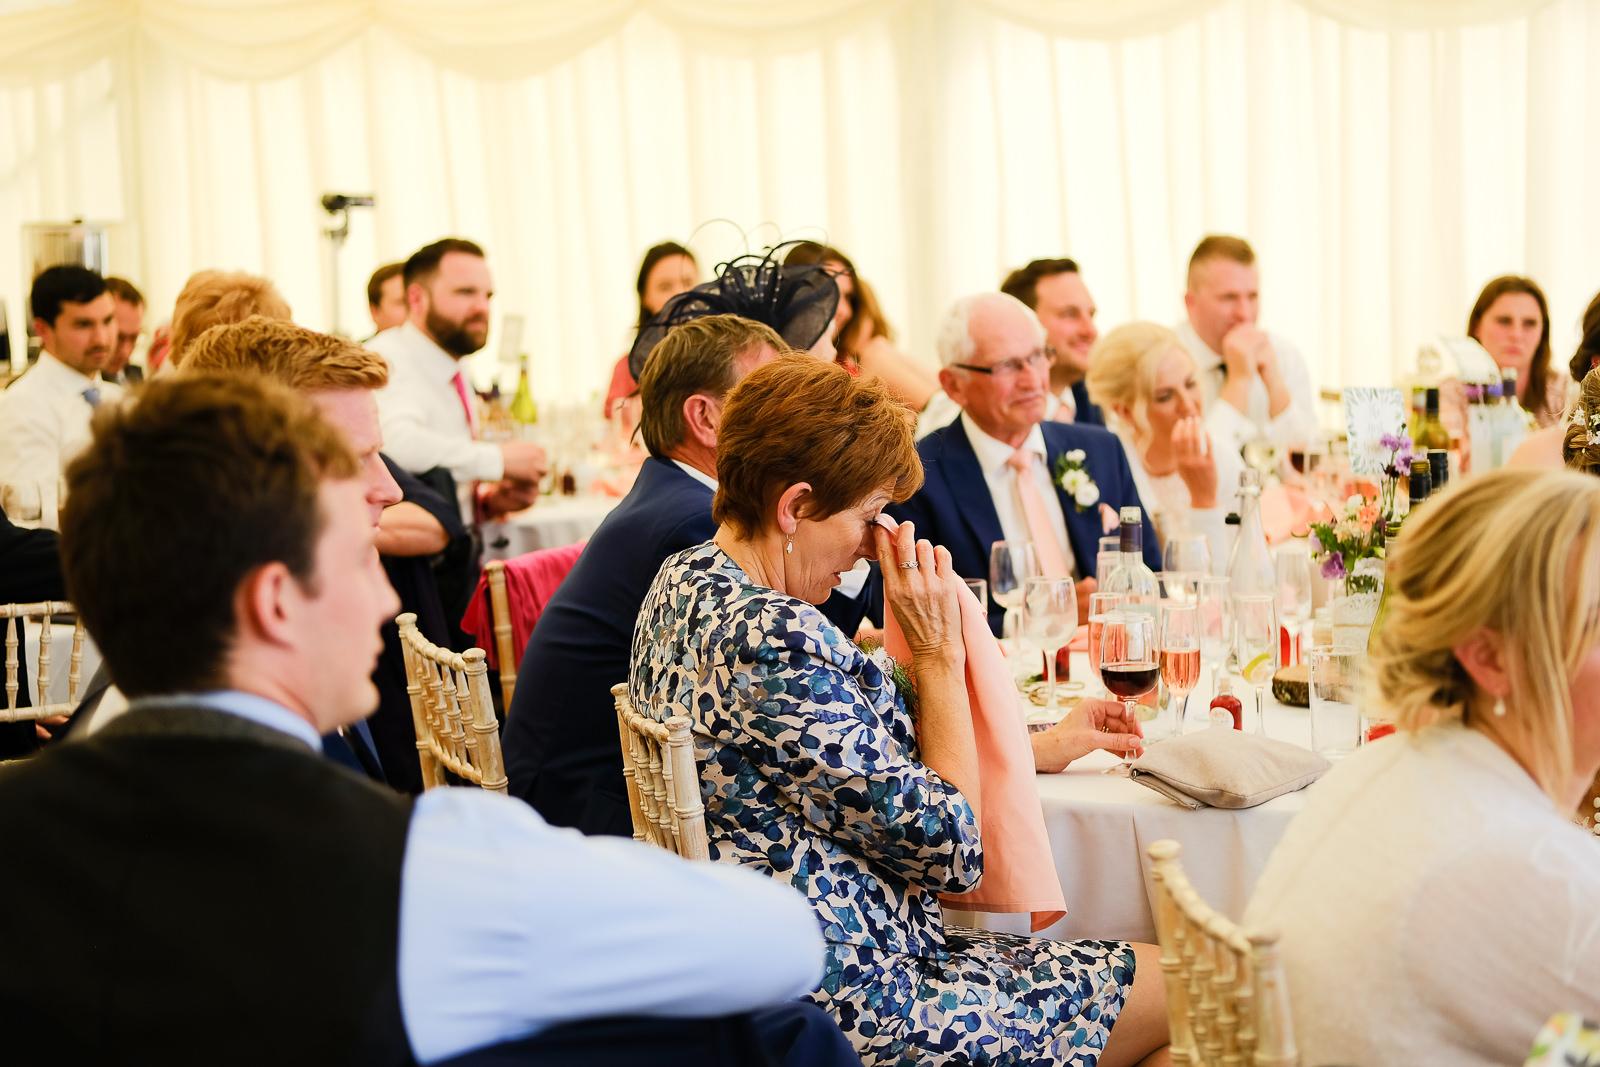 Roscarrock Farm wedding in Cornwall 062.jpg